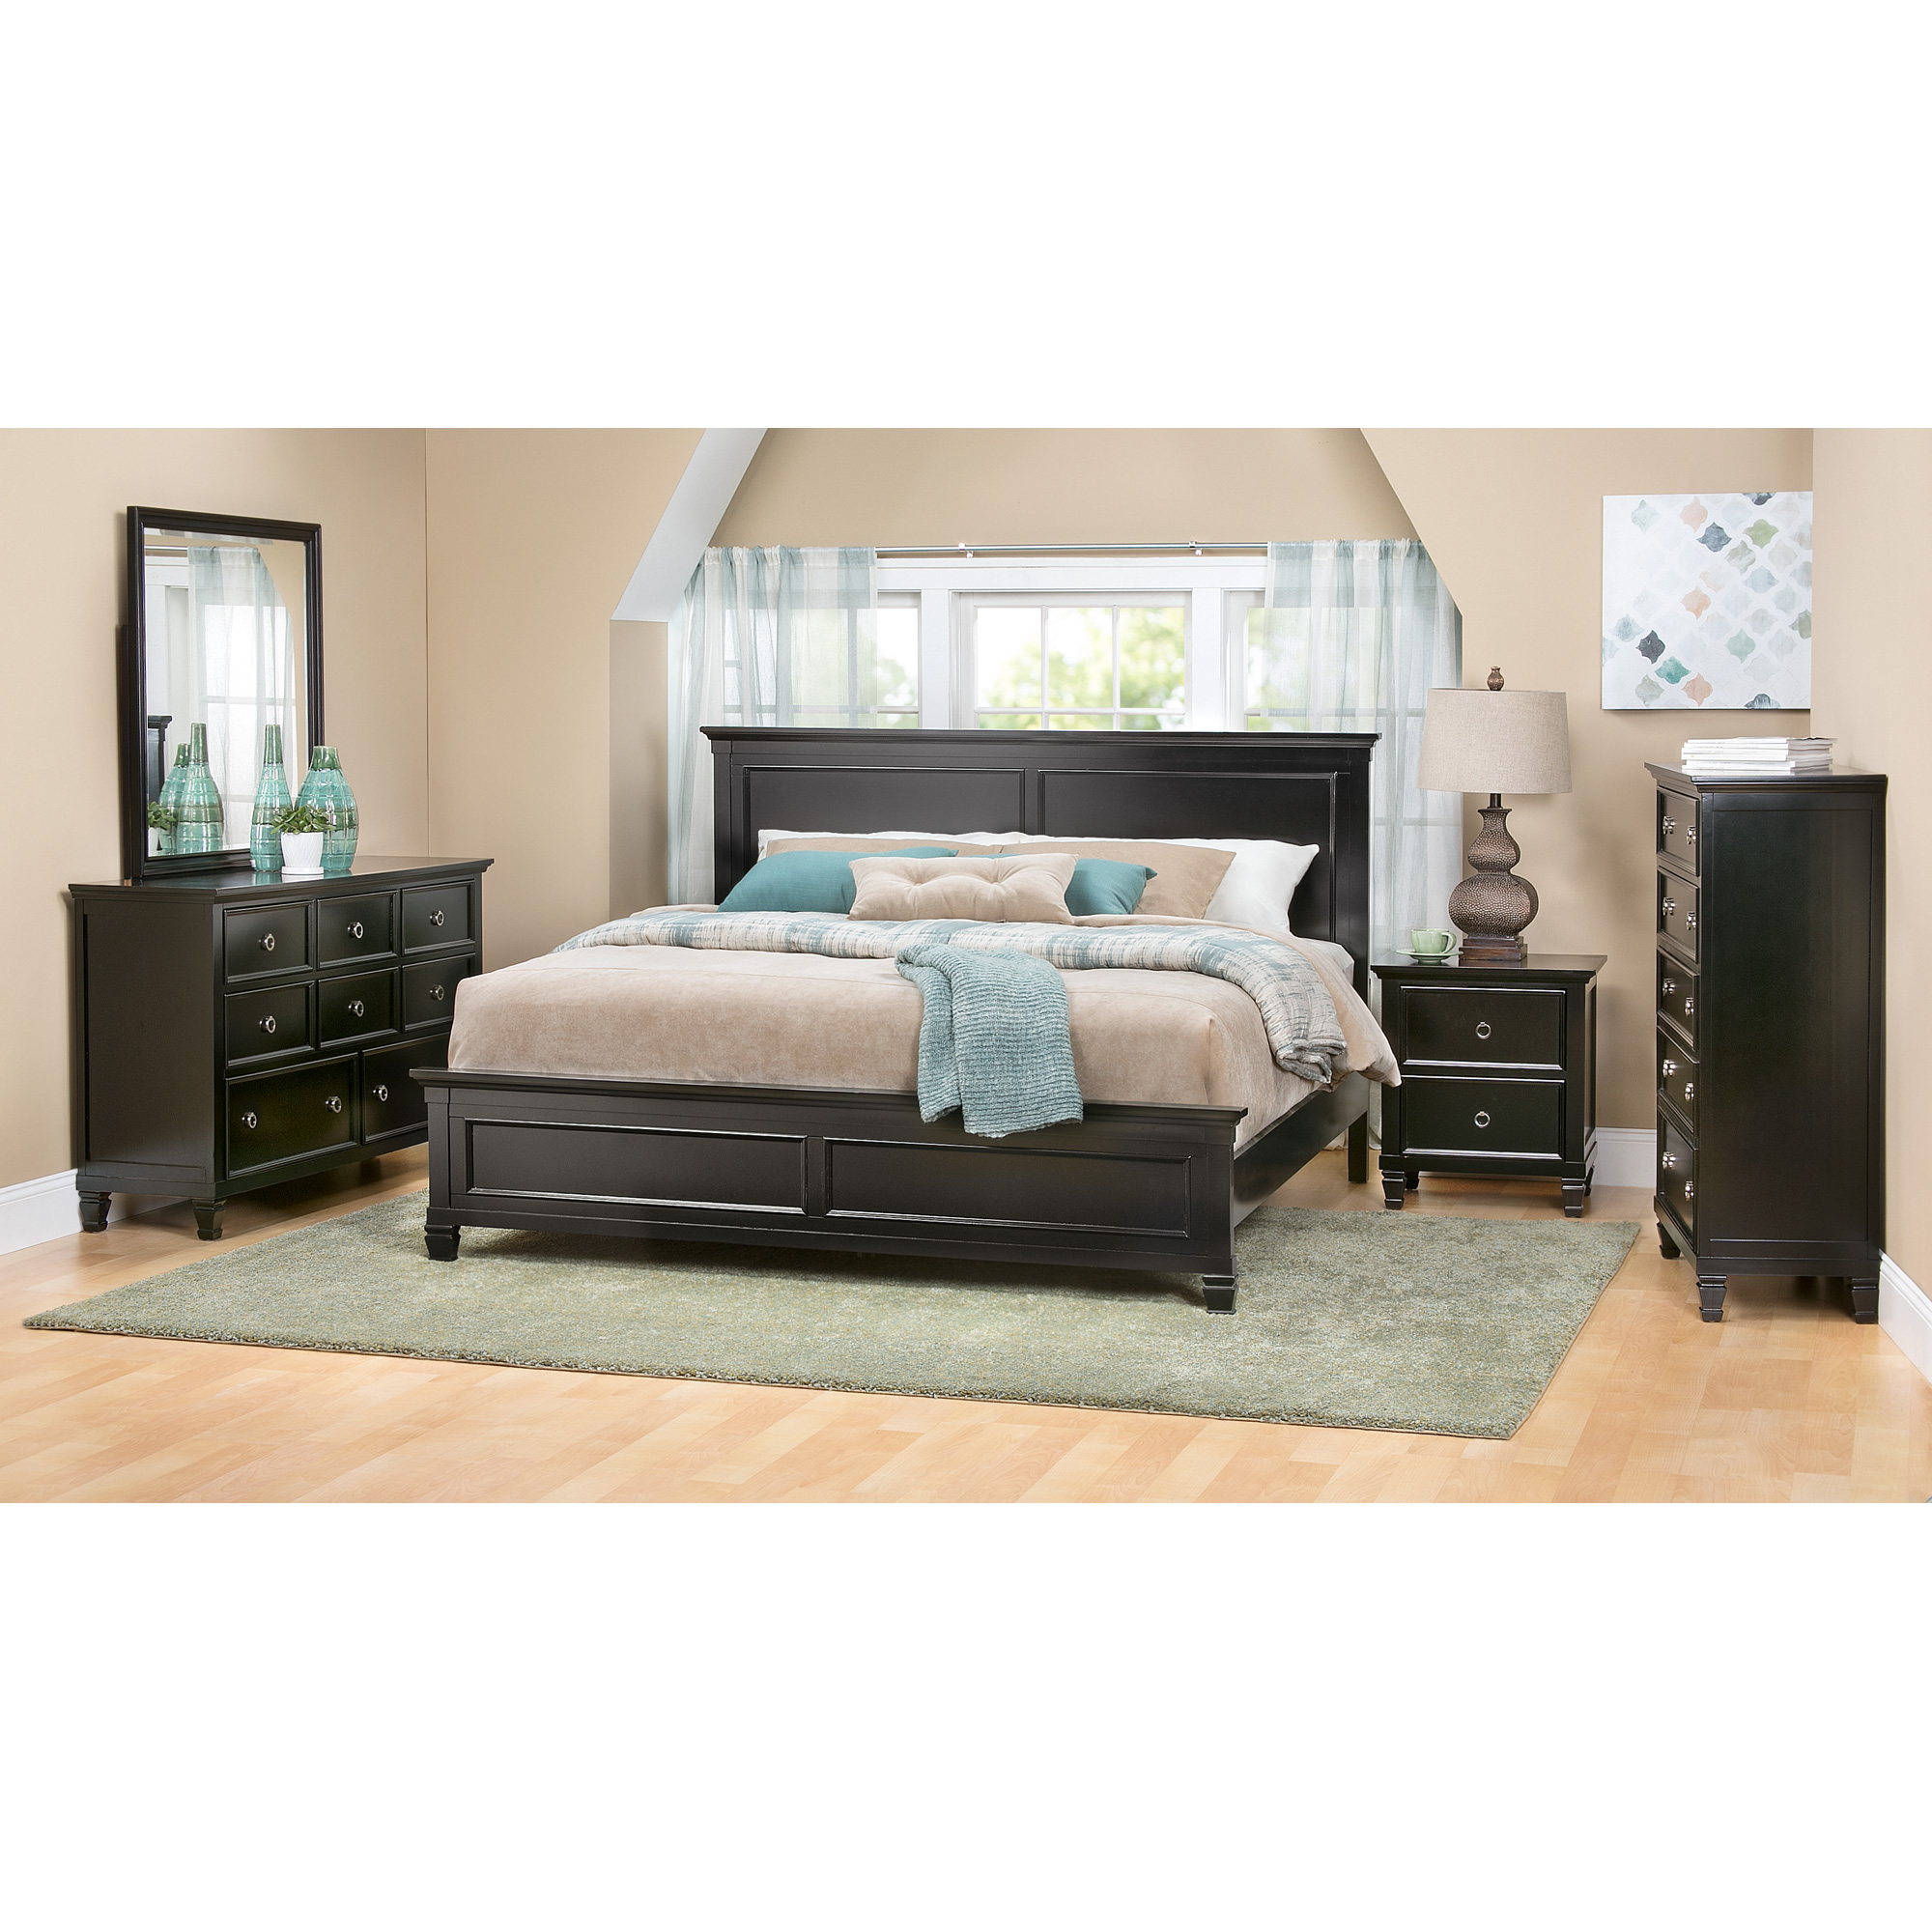 New Classic | Persia II Black Full 4 Piece Room Group Bedroom Set